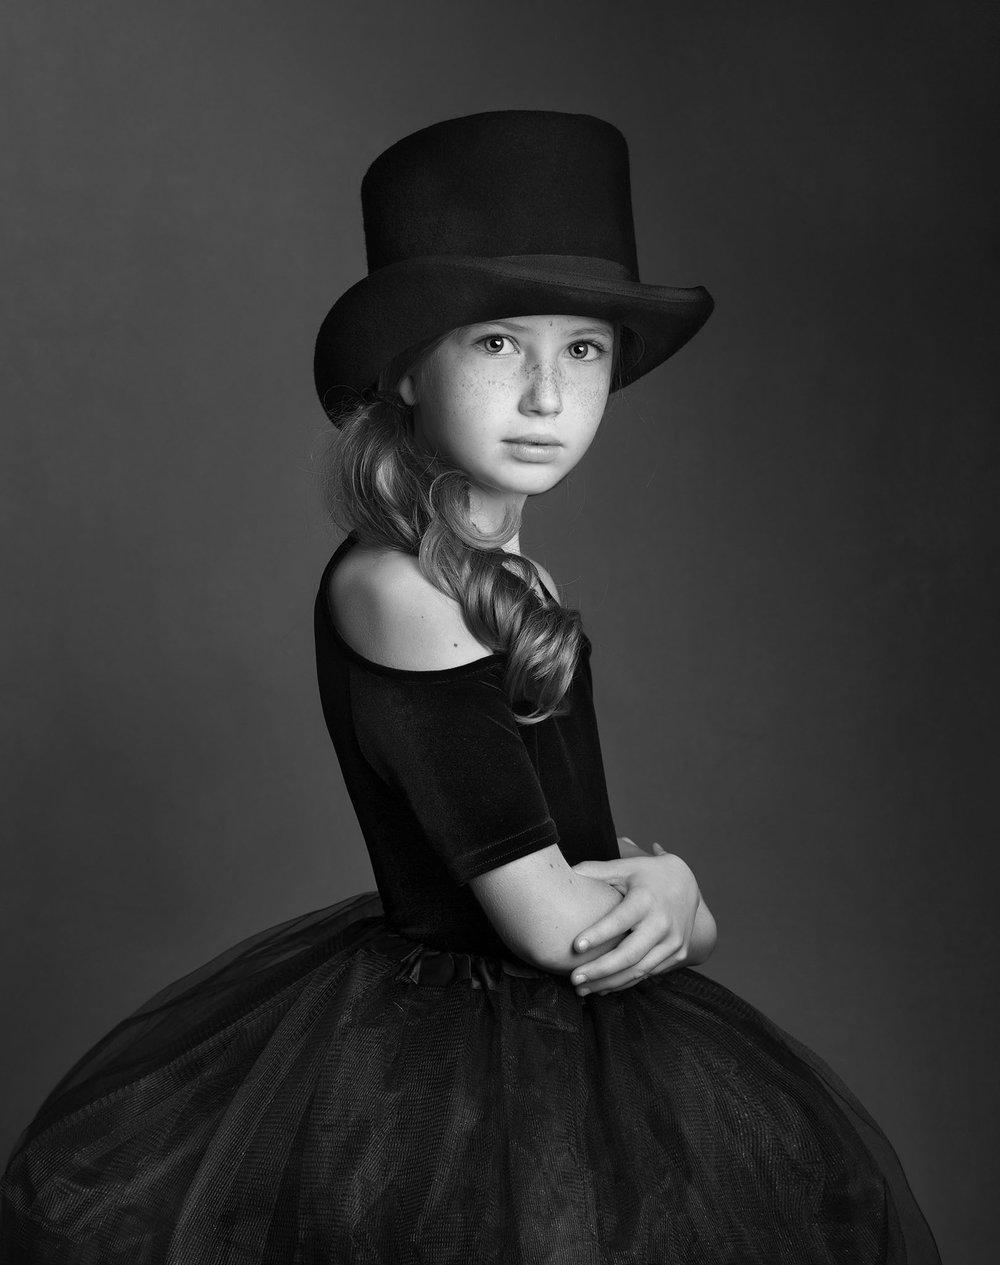 elizabethgphotography_kingslangley_hertfordshire_fineart_childrens_photography_65.jpg